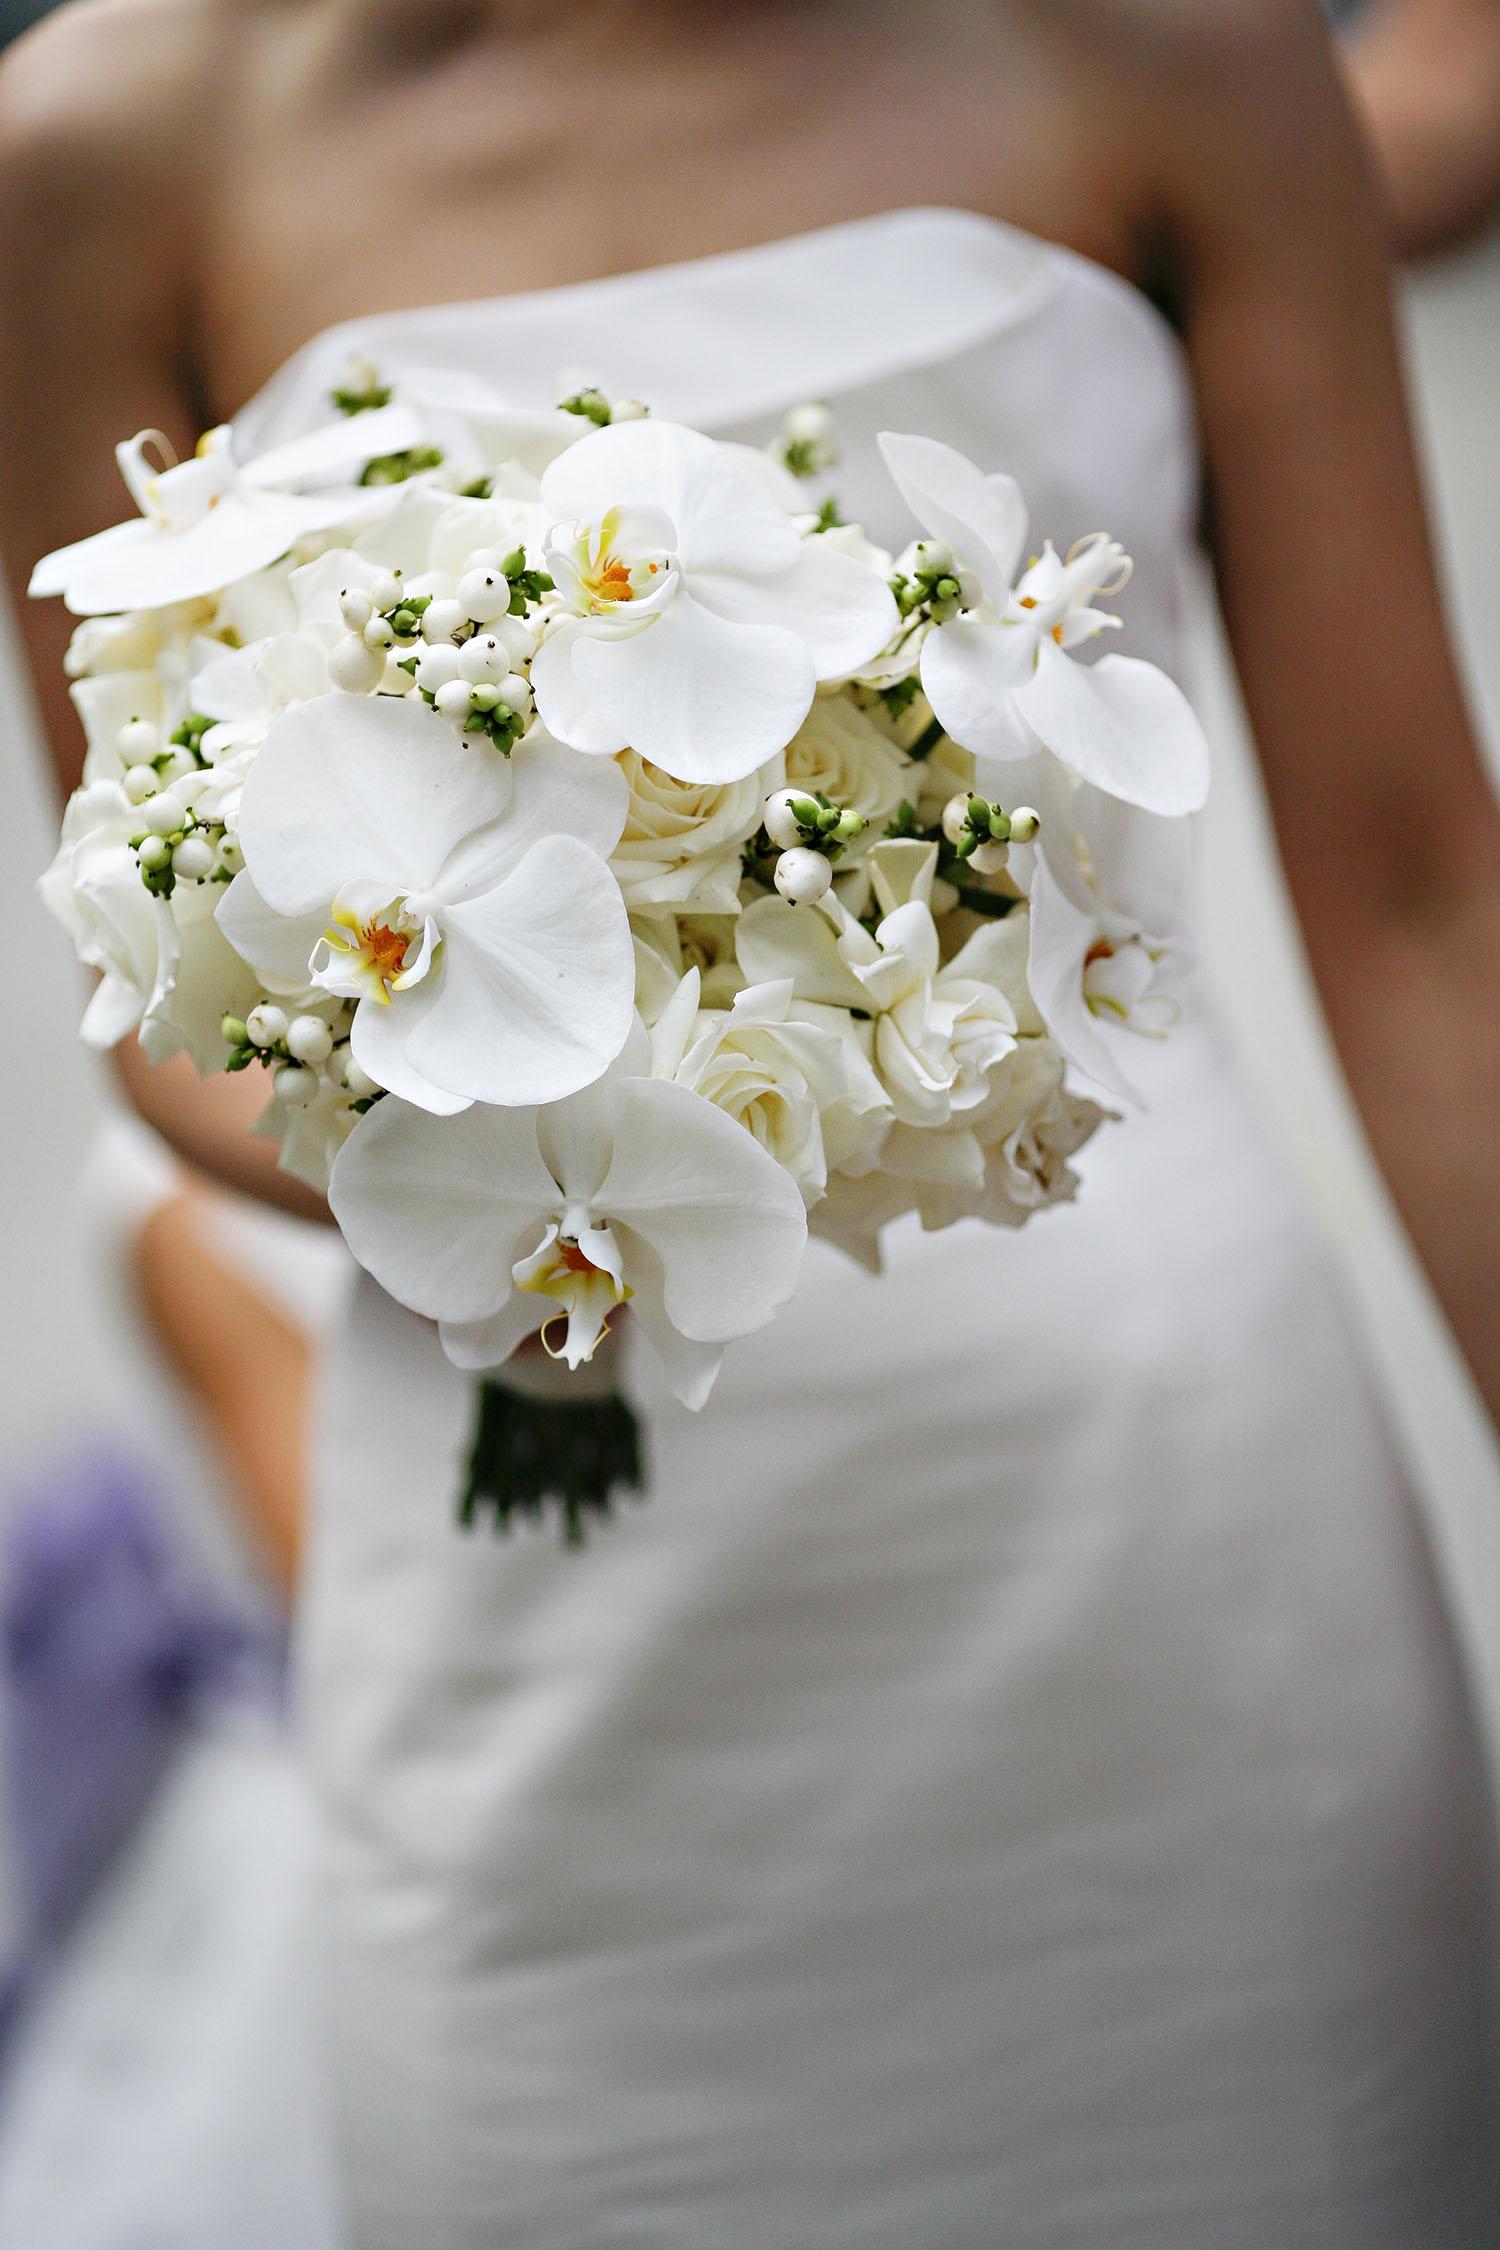 Art of Love Photography  | Wedding Reception | LeMeridien Hotel, Philadelphia, PA